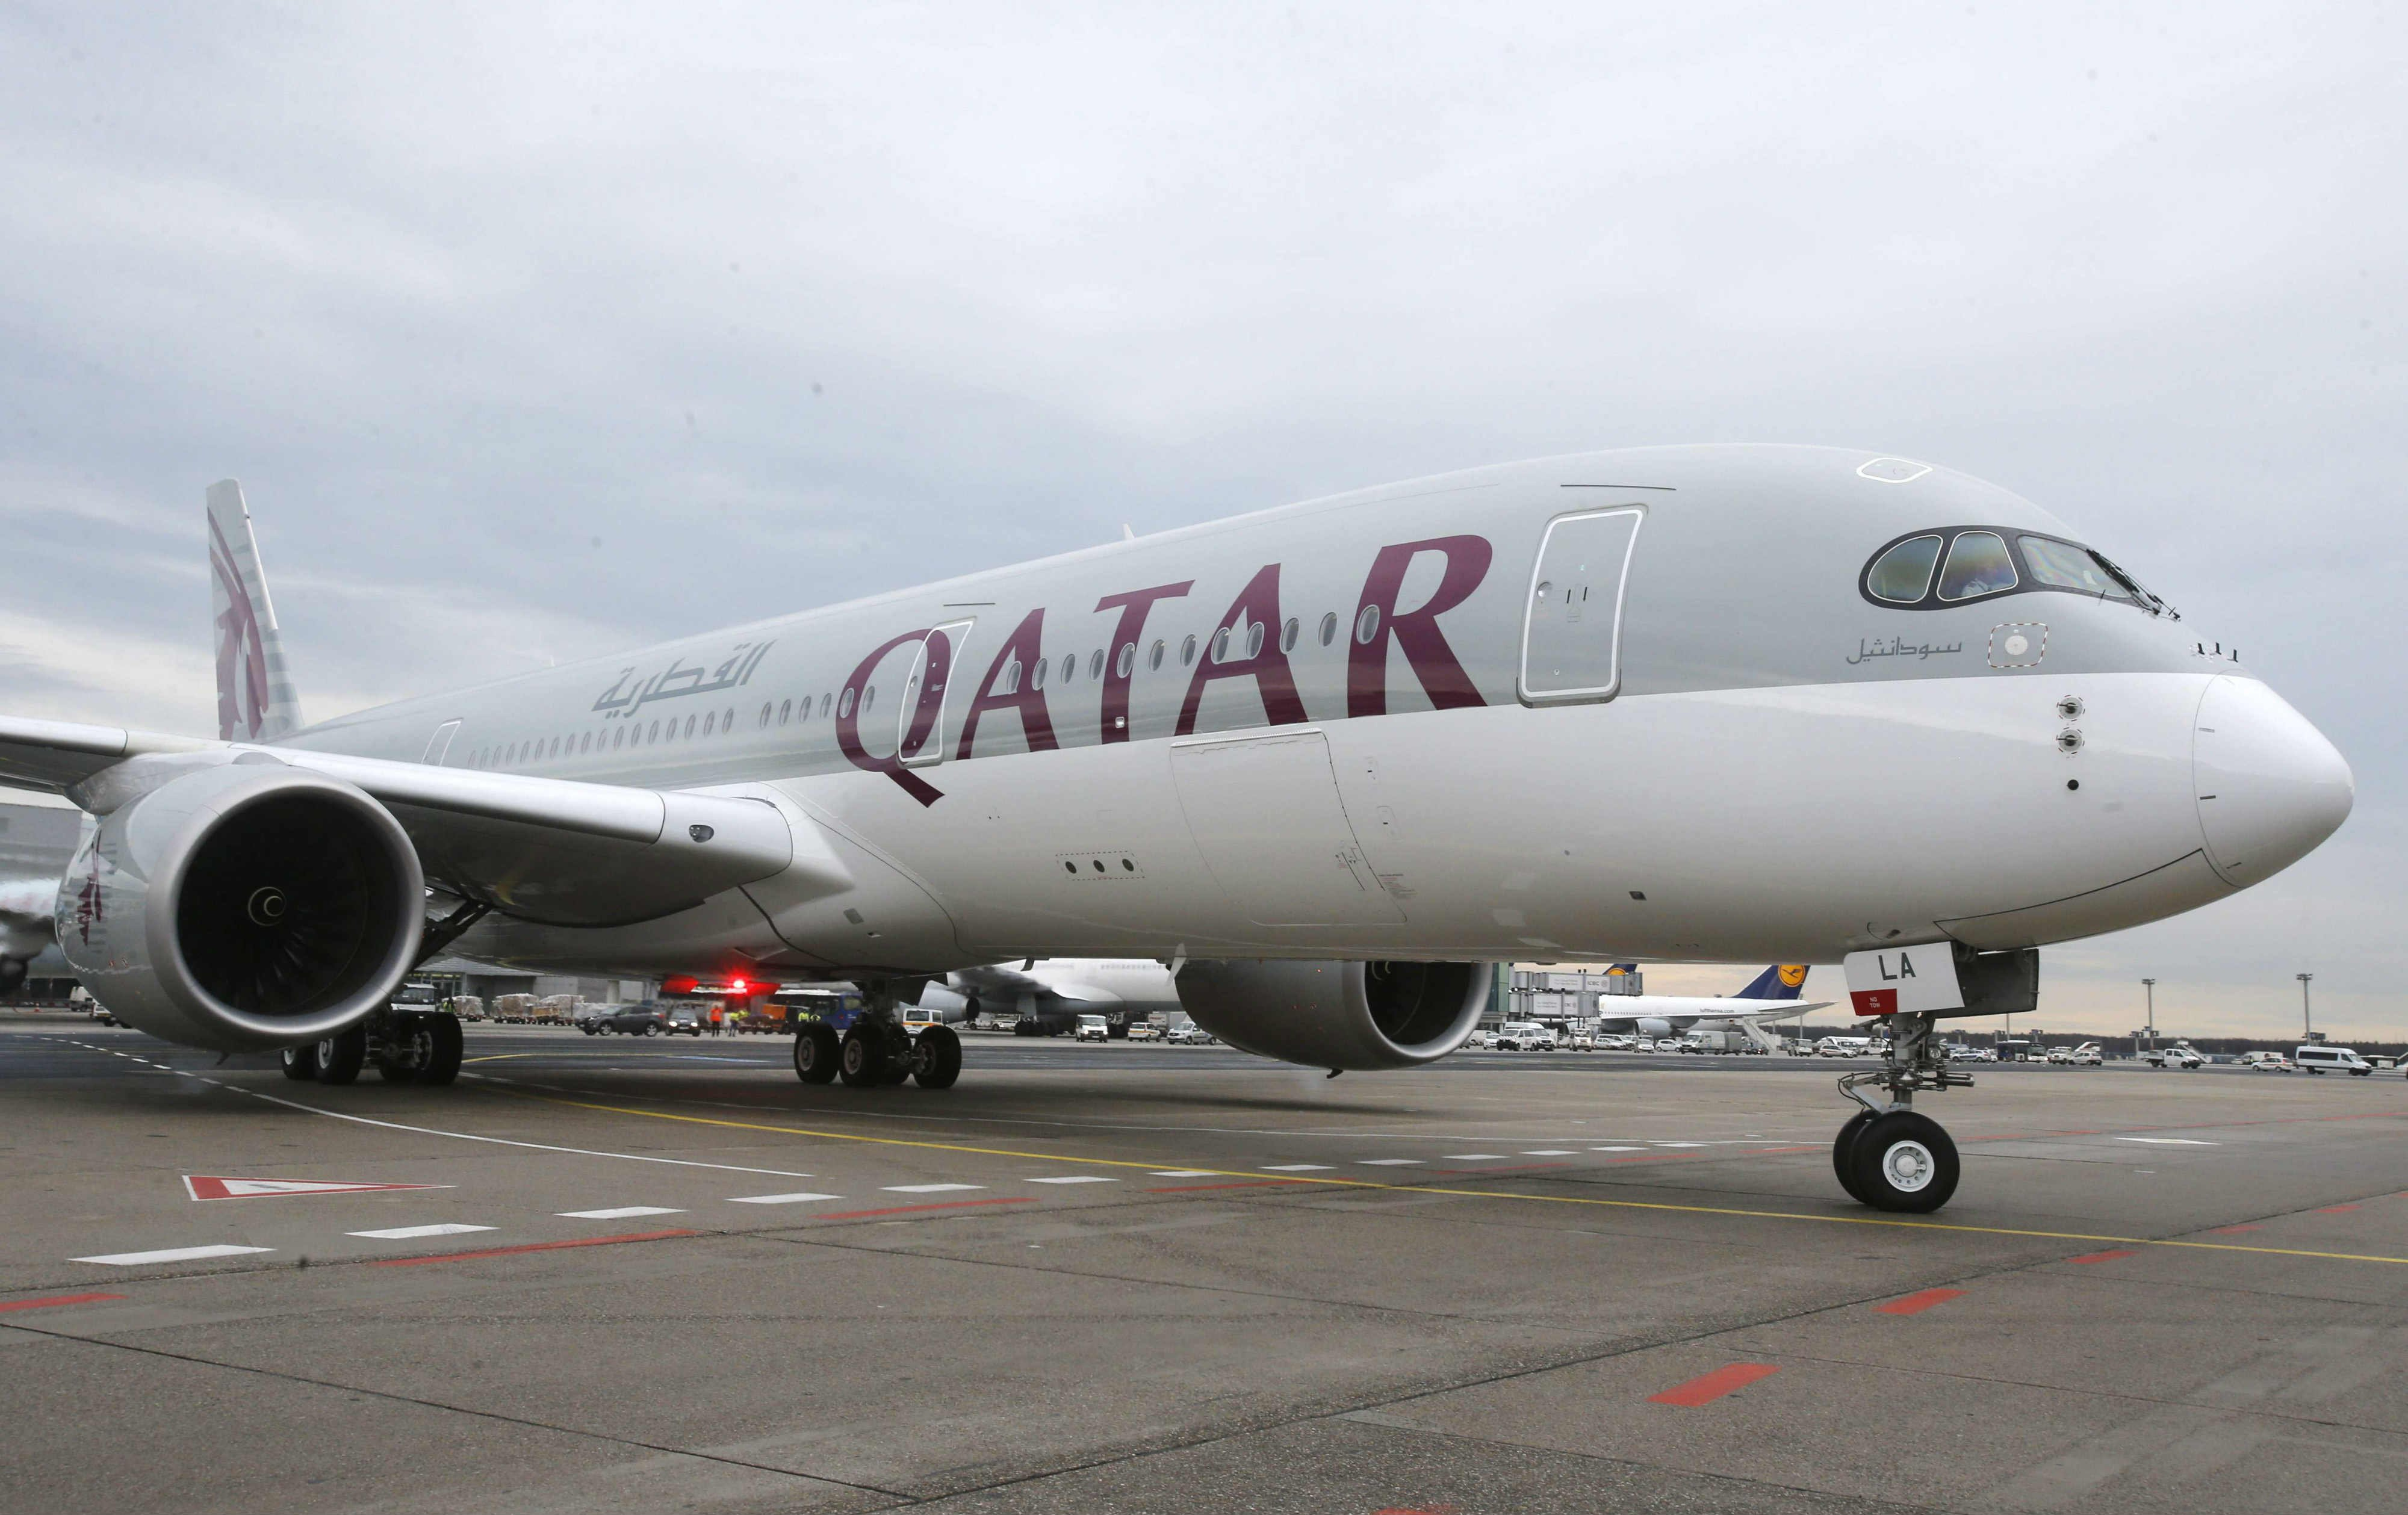 Un avion de la compagnie Qatar Airways. Photo d'illustration.